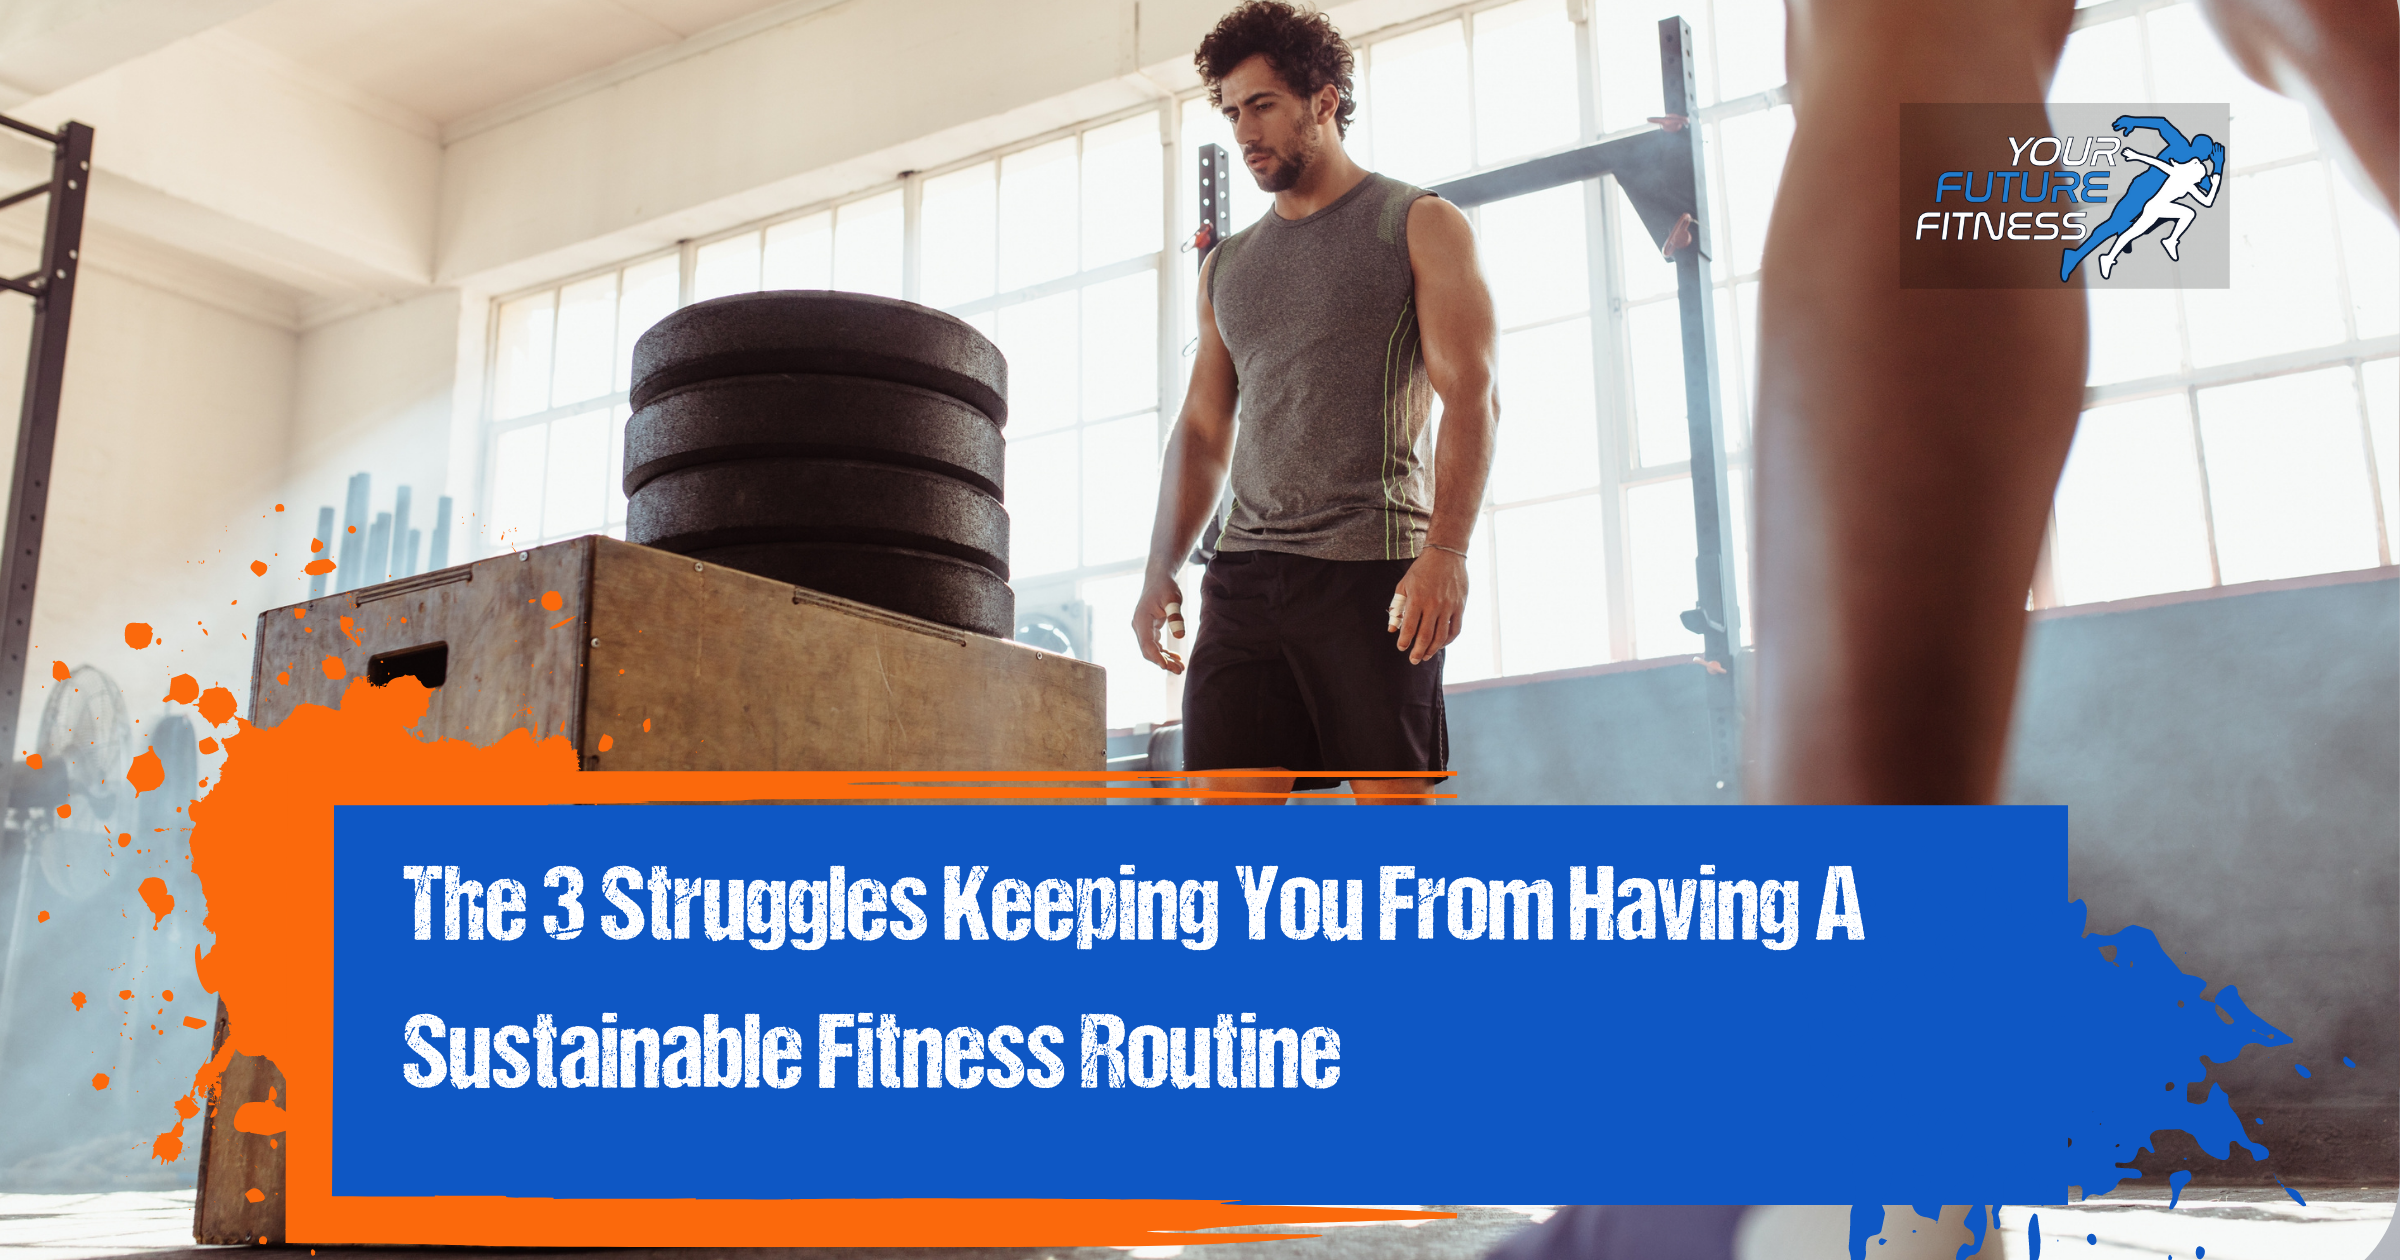 Sustainable Fitness Plan Struggles